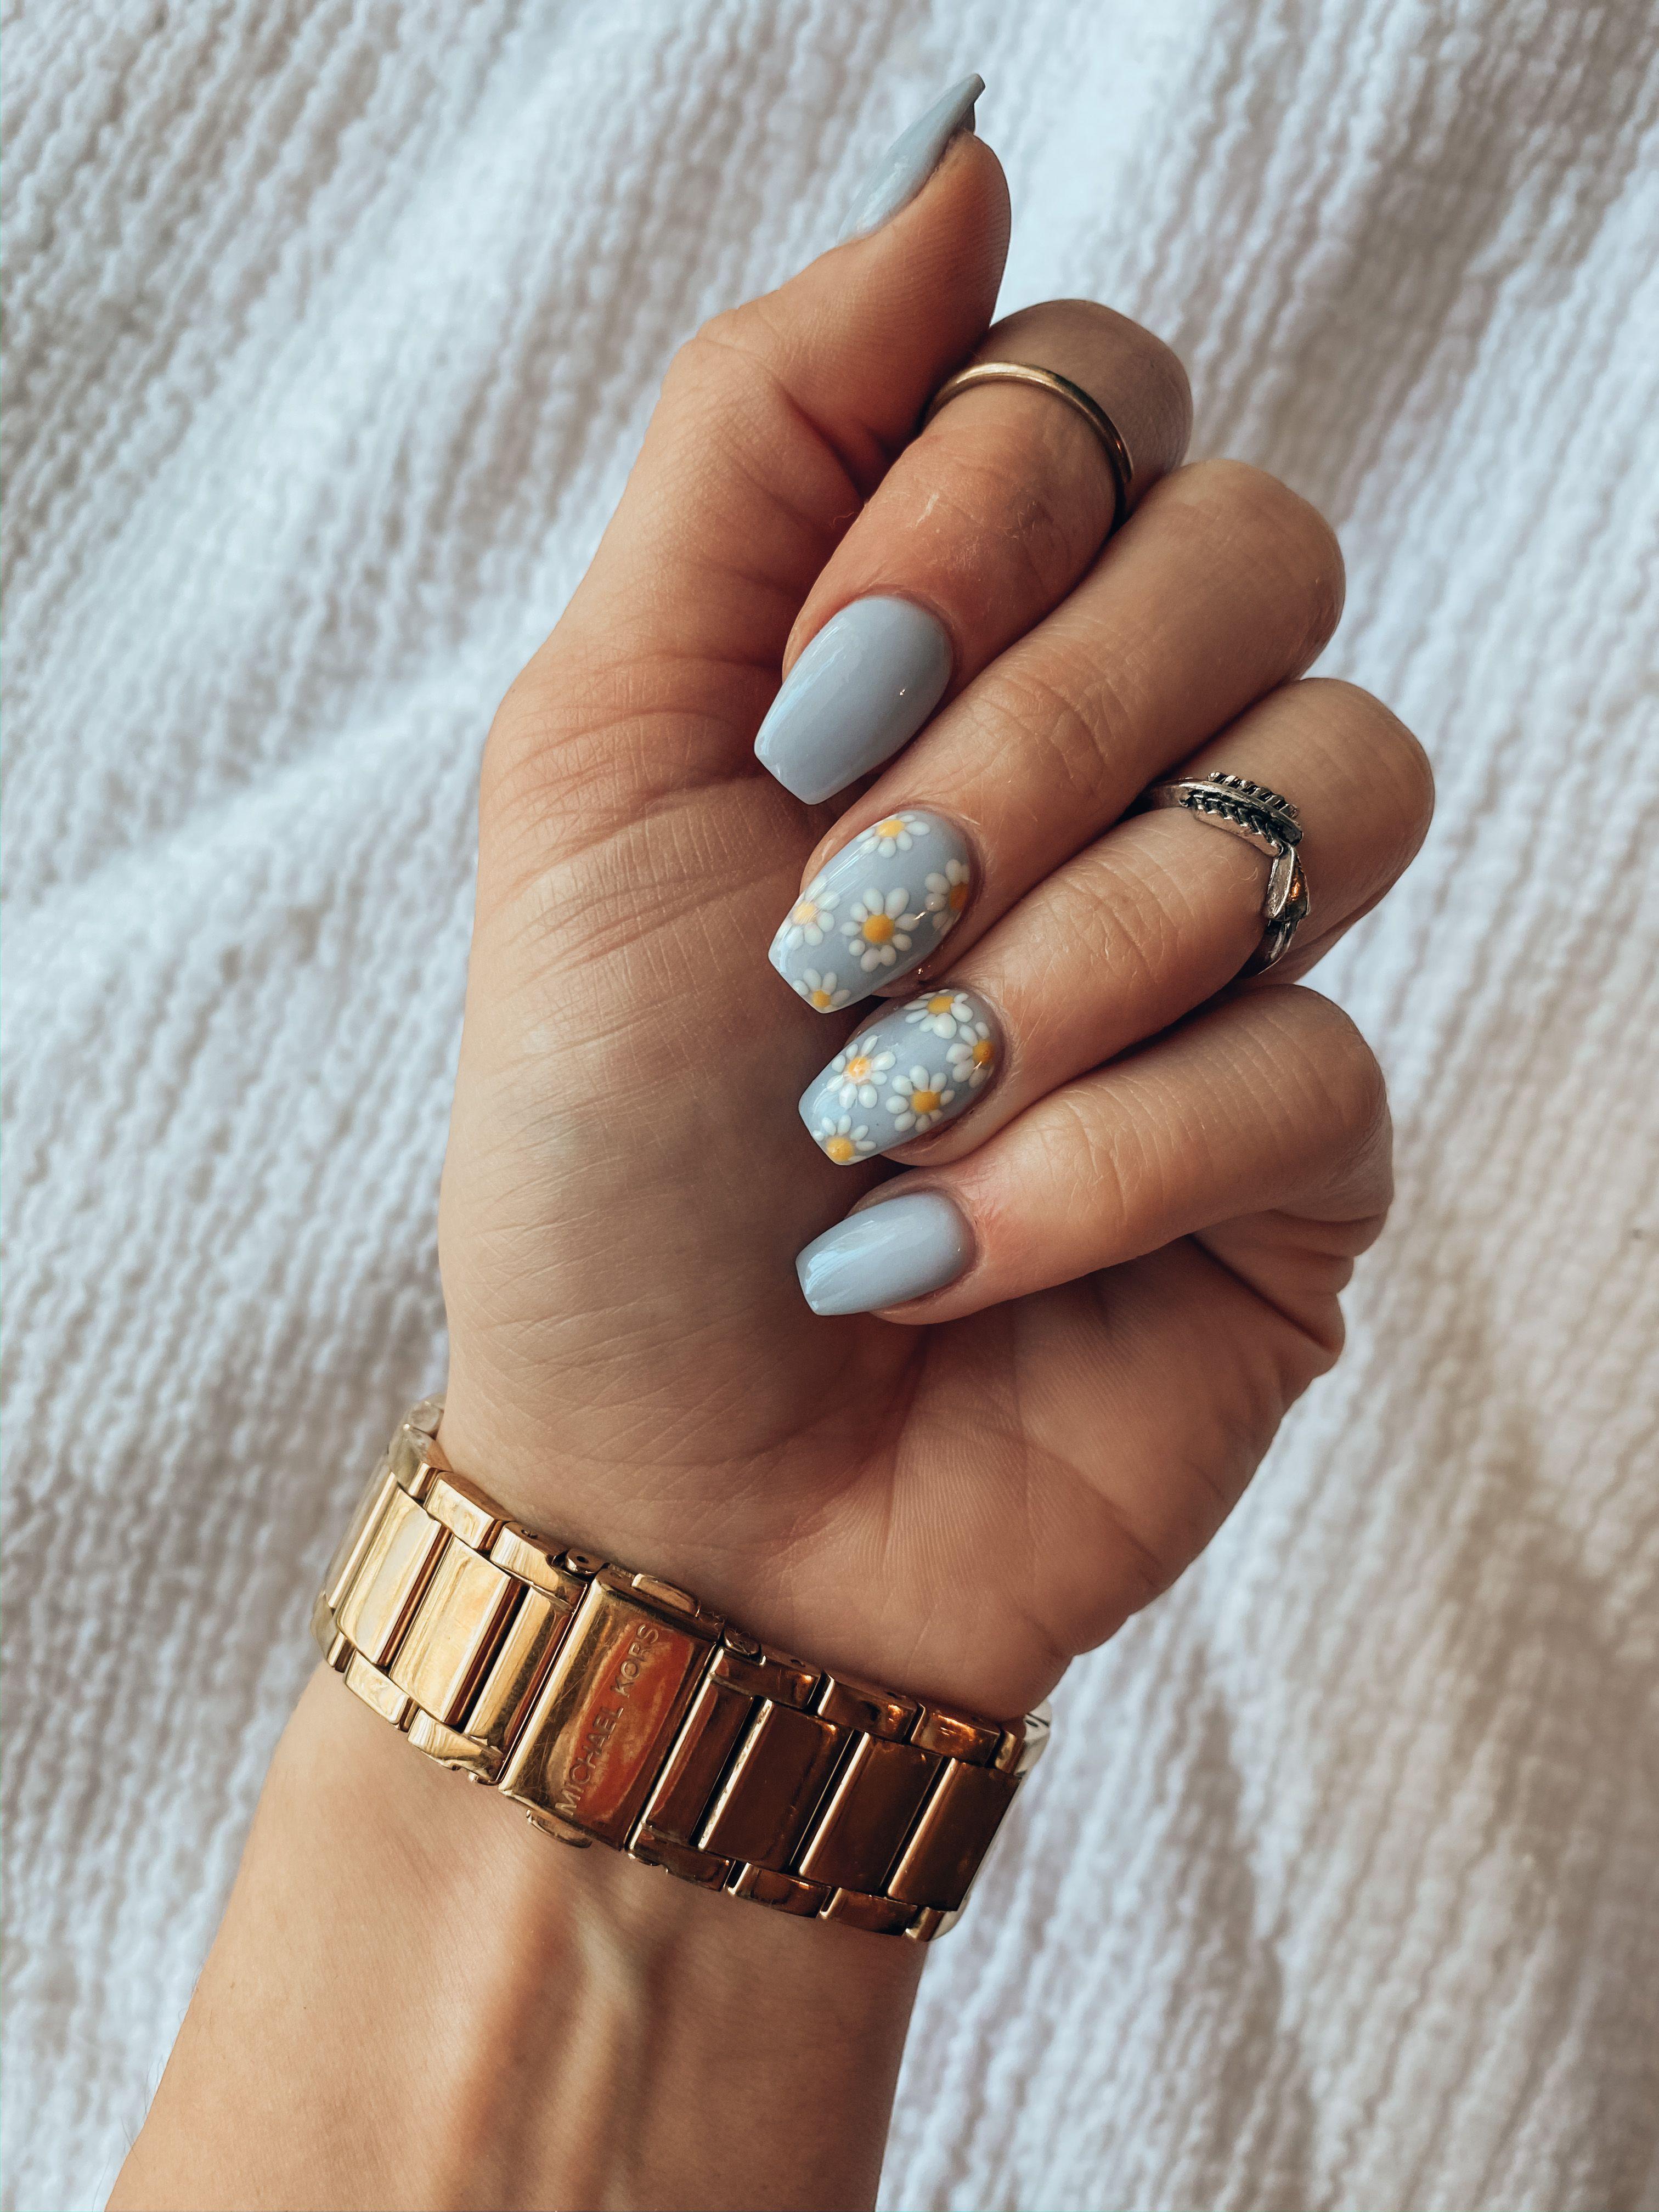 Light blue acrylic nails with daisy design